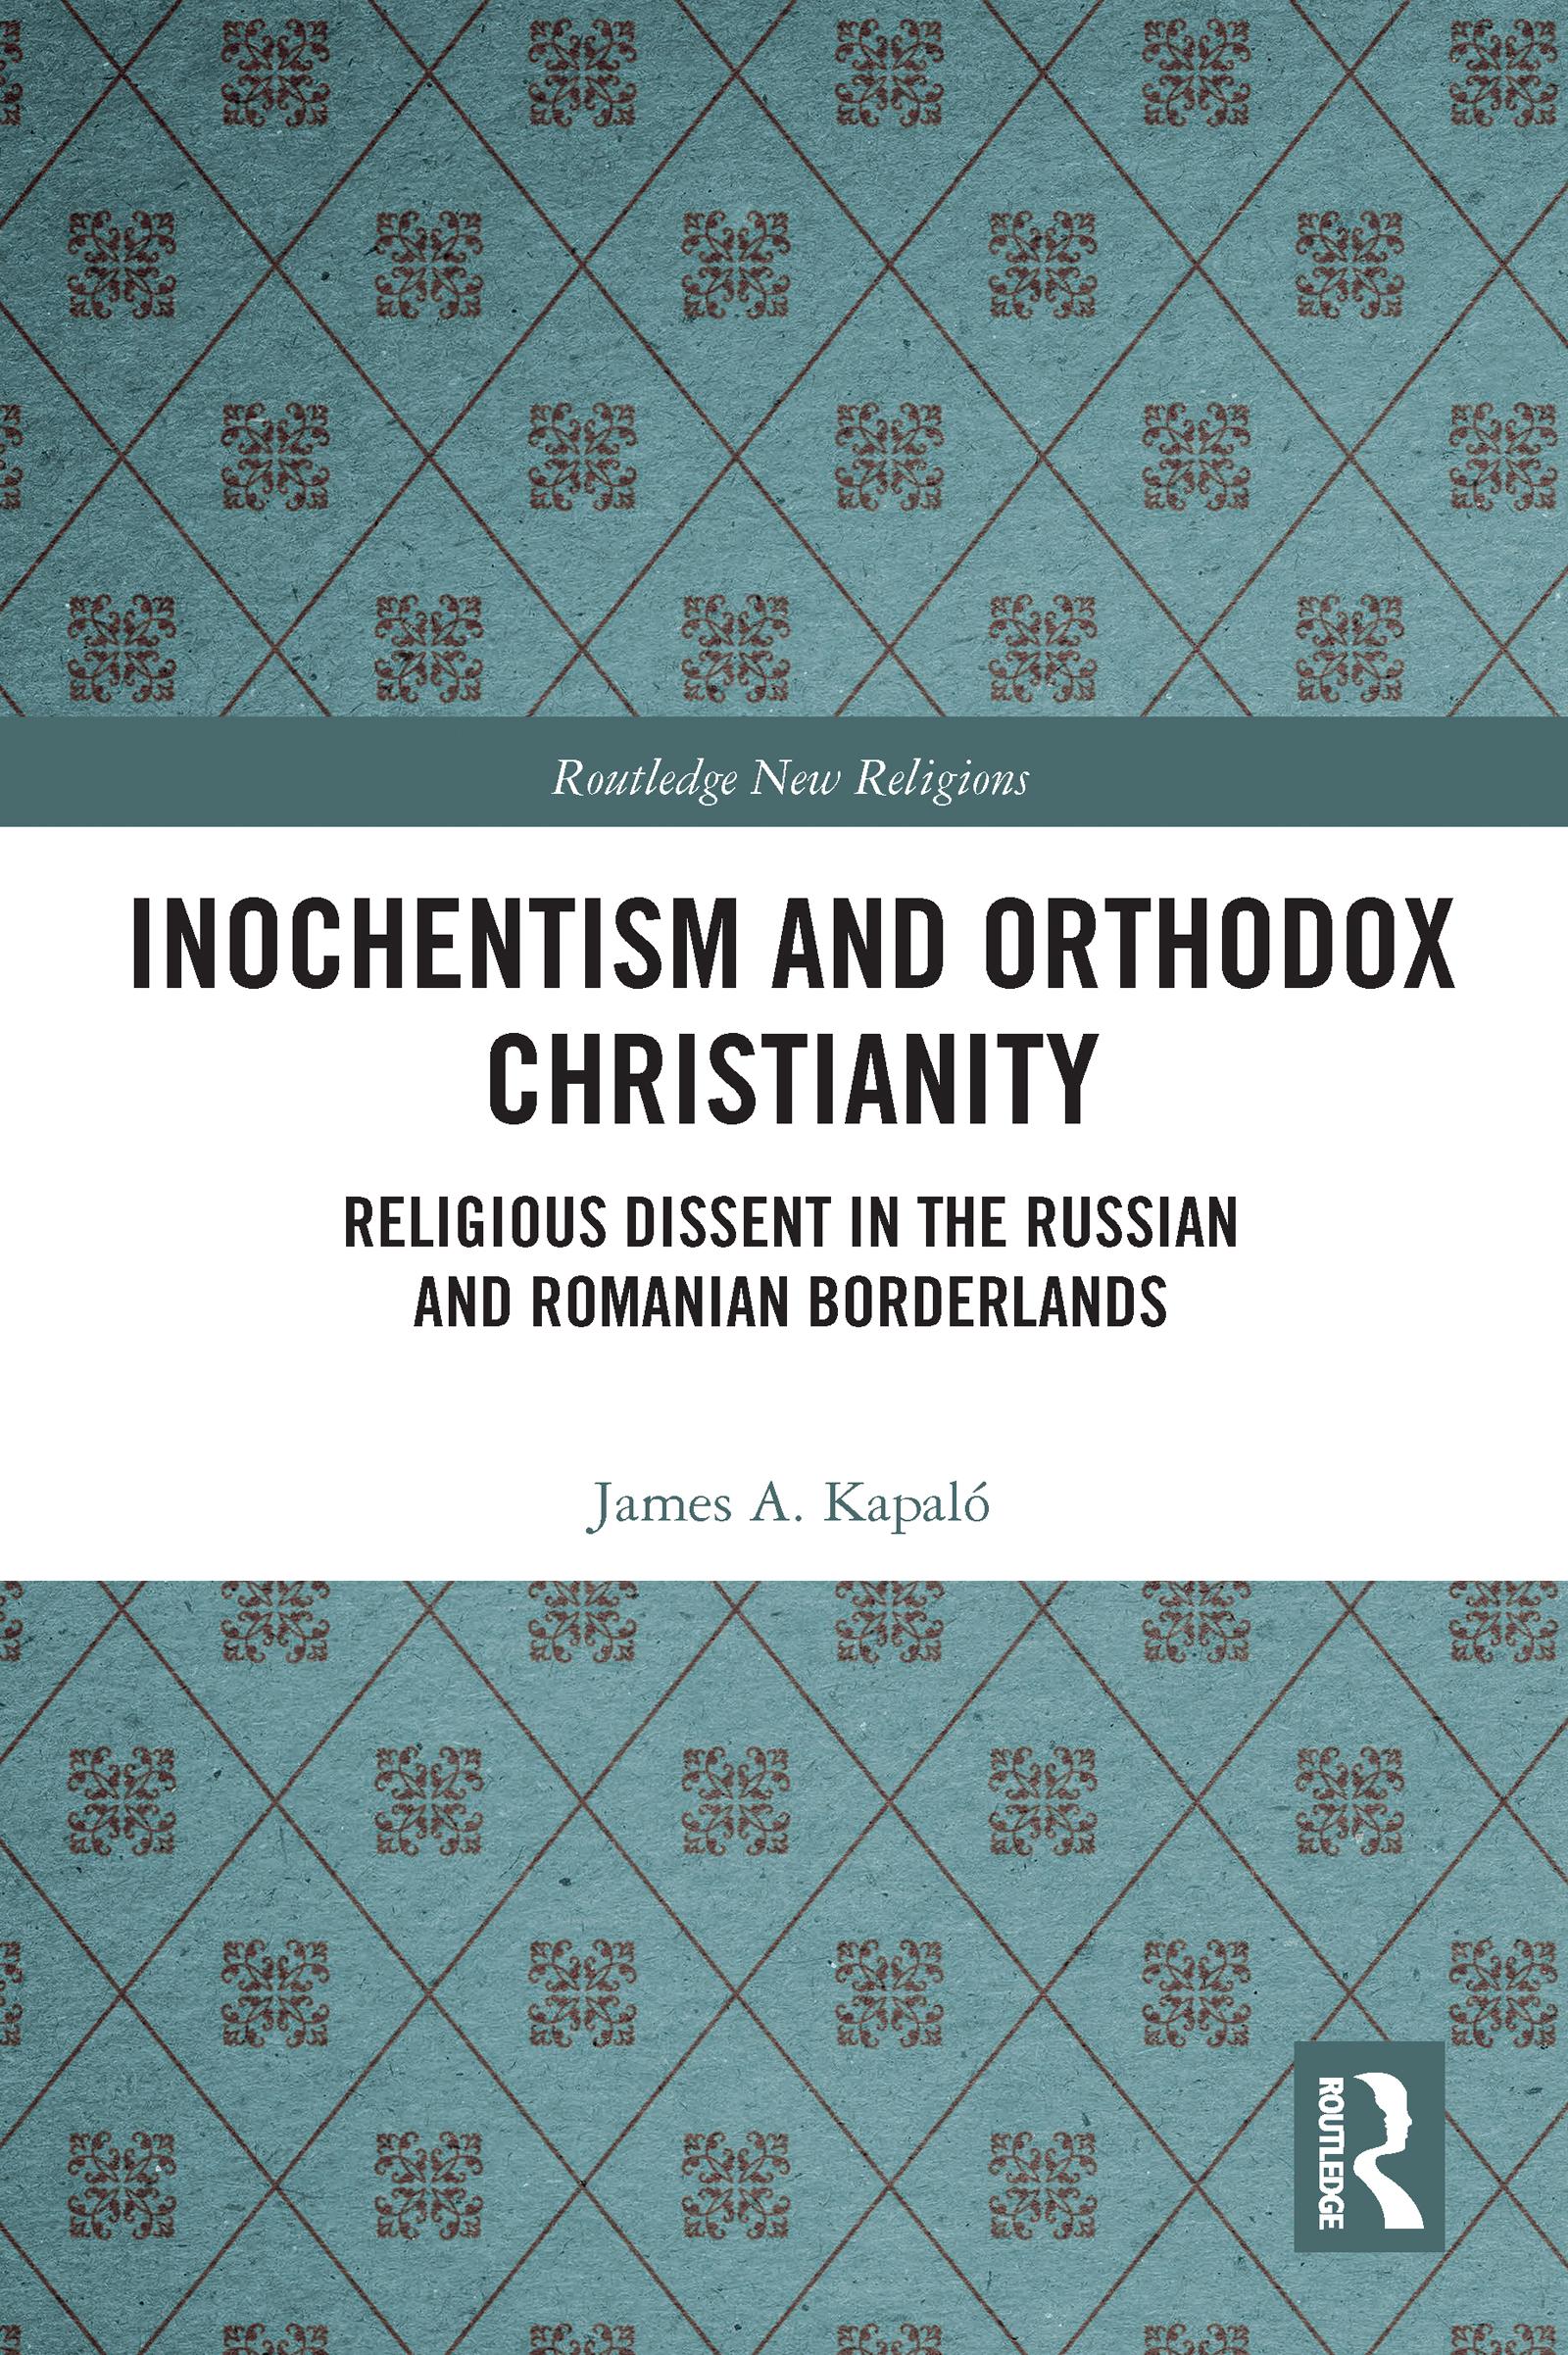 Inochentism and Orthodox Christianity